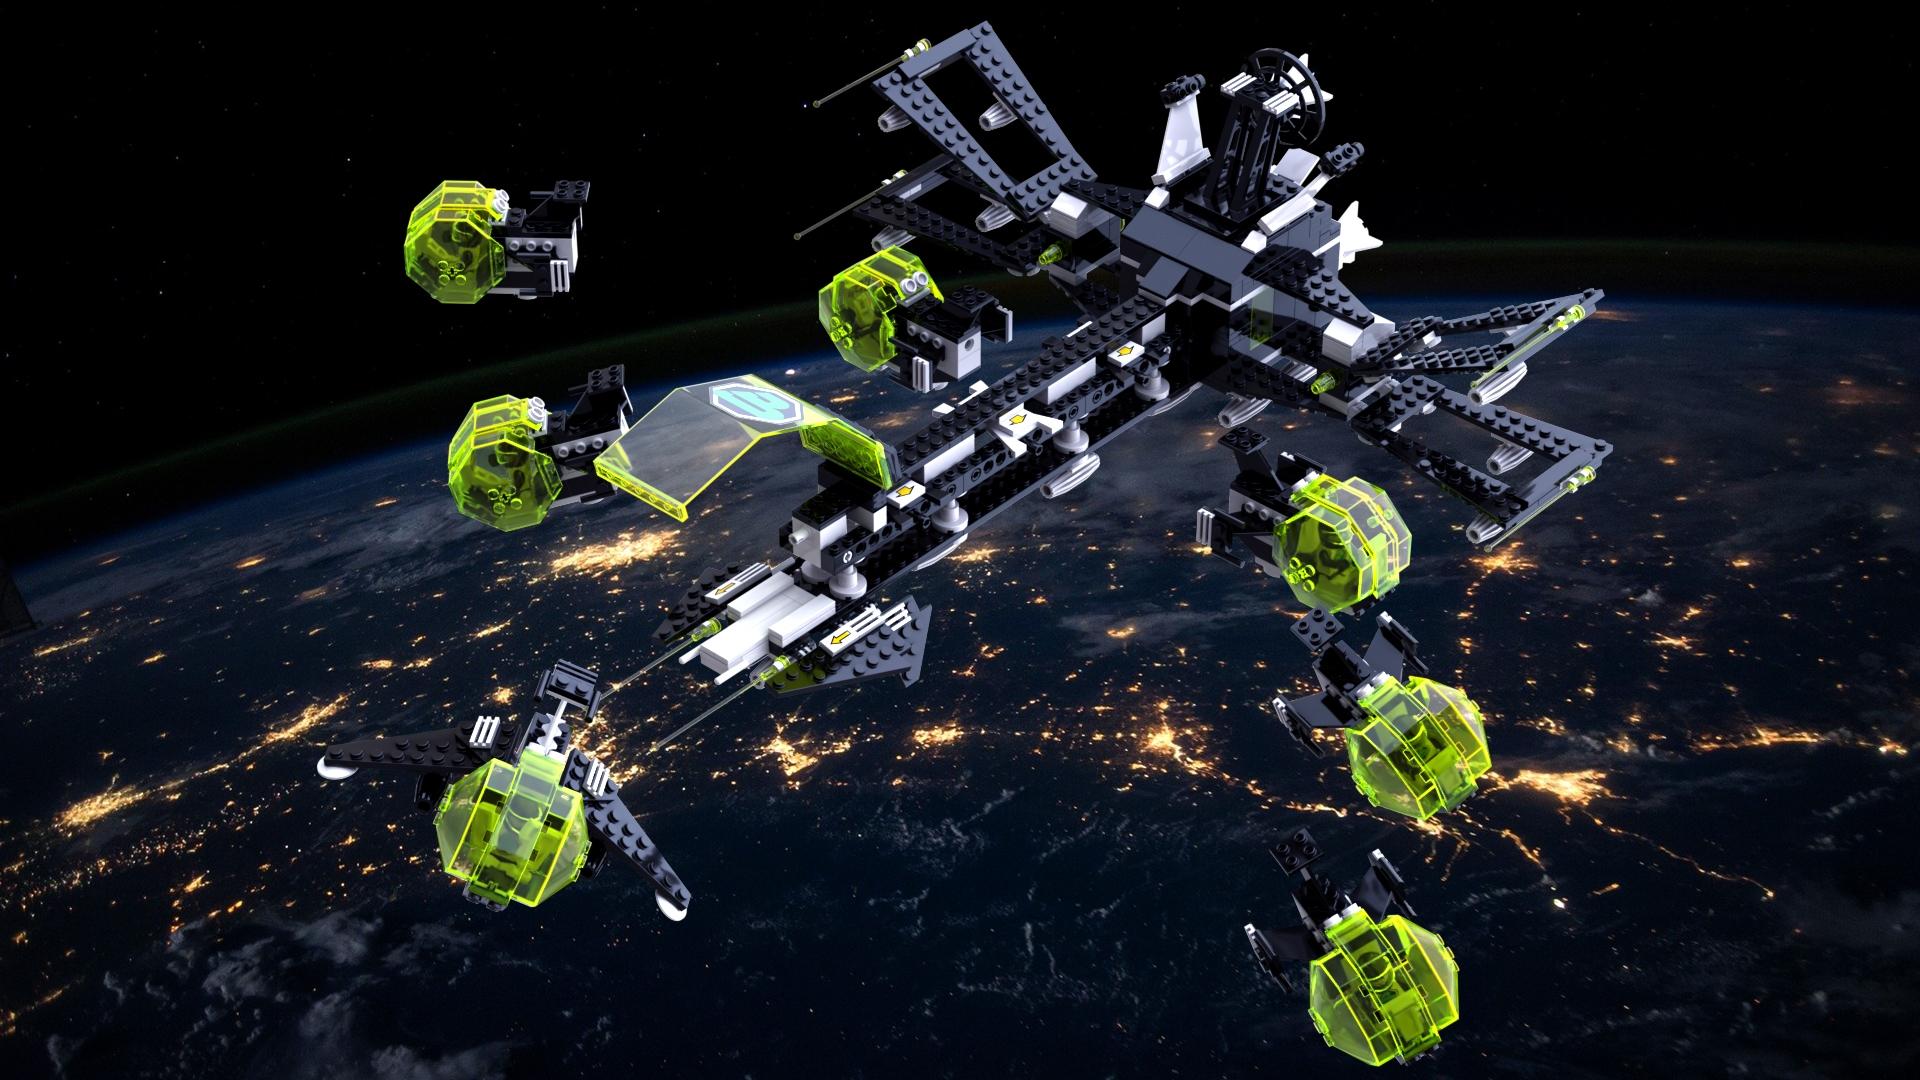 LEGO Blacktron 2 - AFIF - Deploying intruder ships